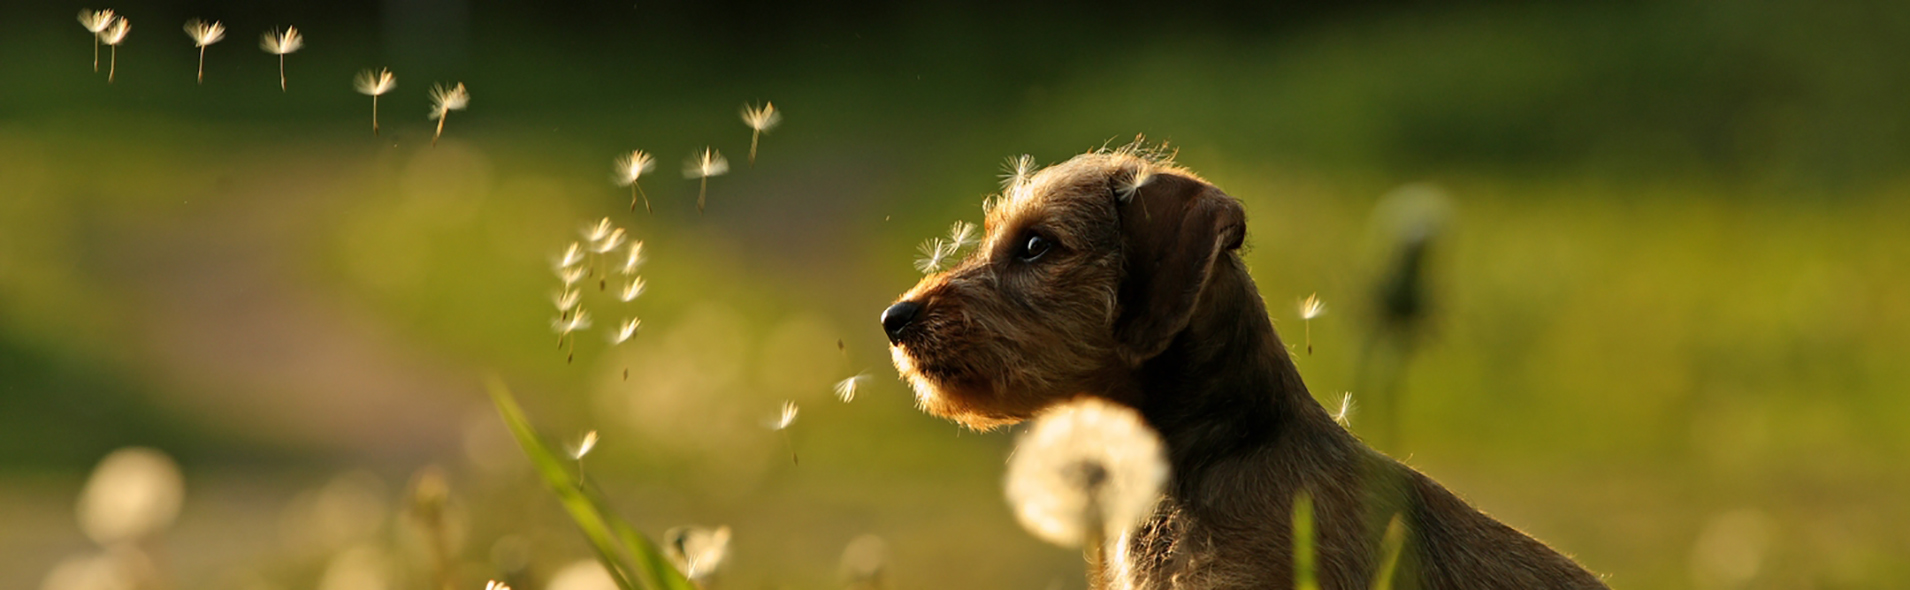 Slider Original Hundeknipserei Pusteblumen2